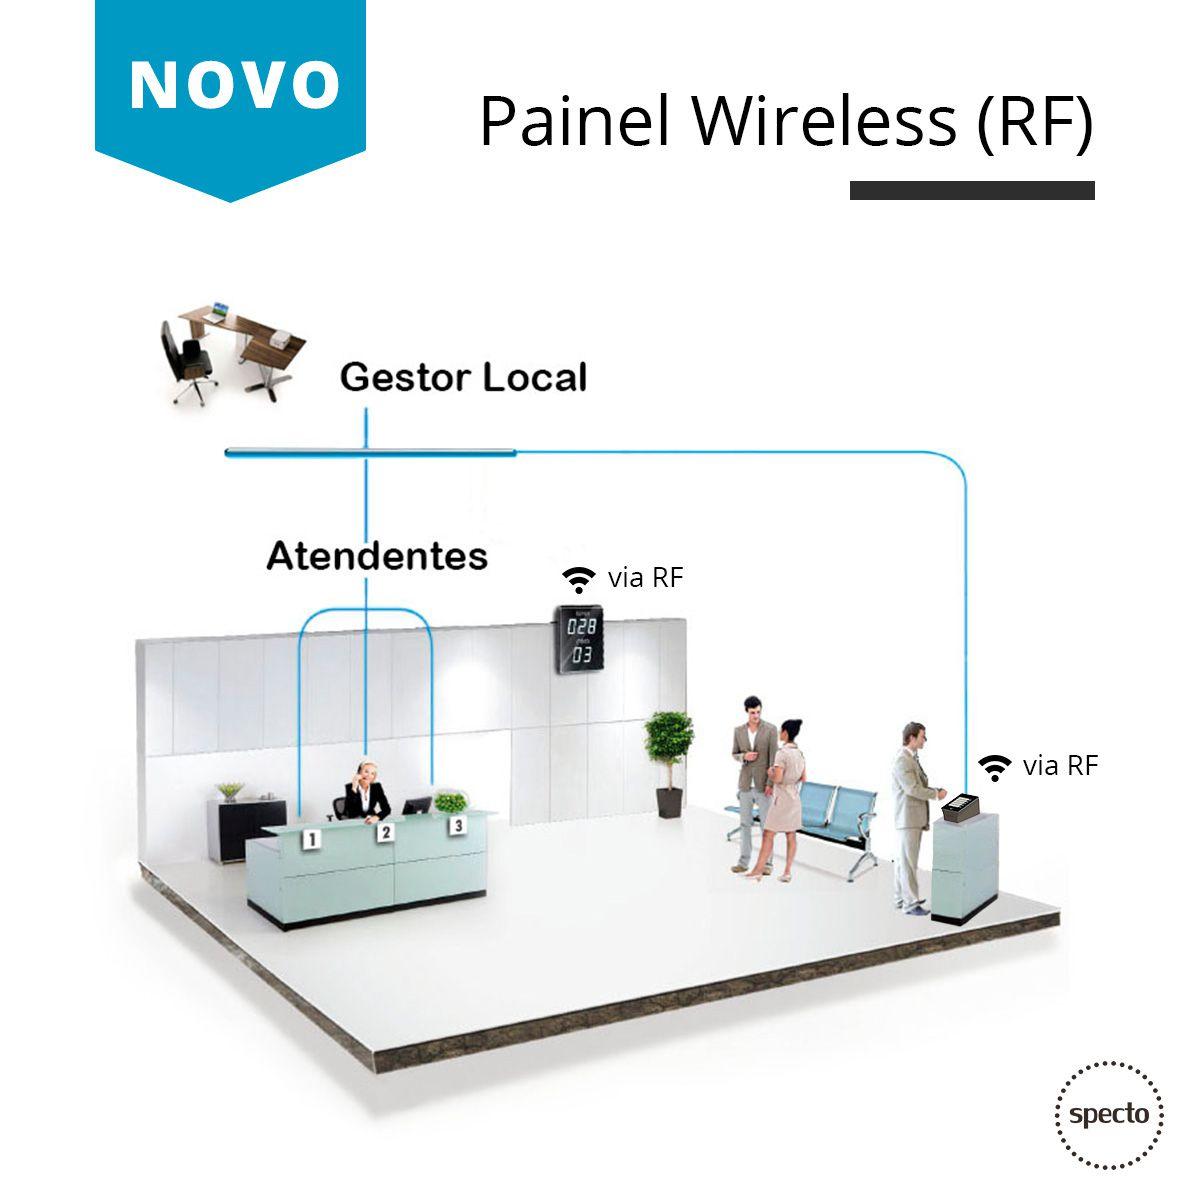 QUALPROX® UNITY Led Wireless com DES Contact  -  Specto Tecnologia